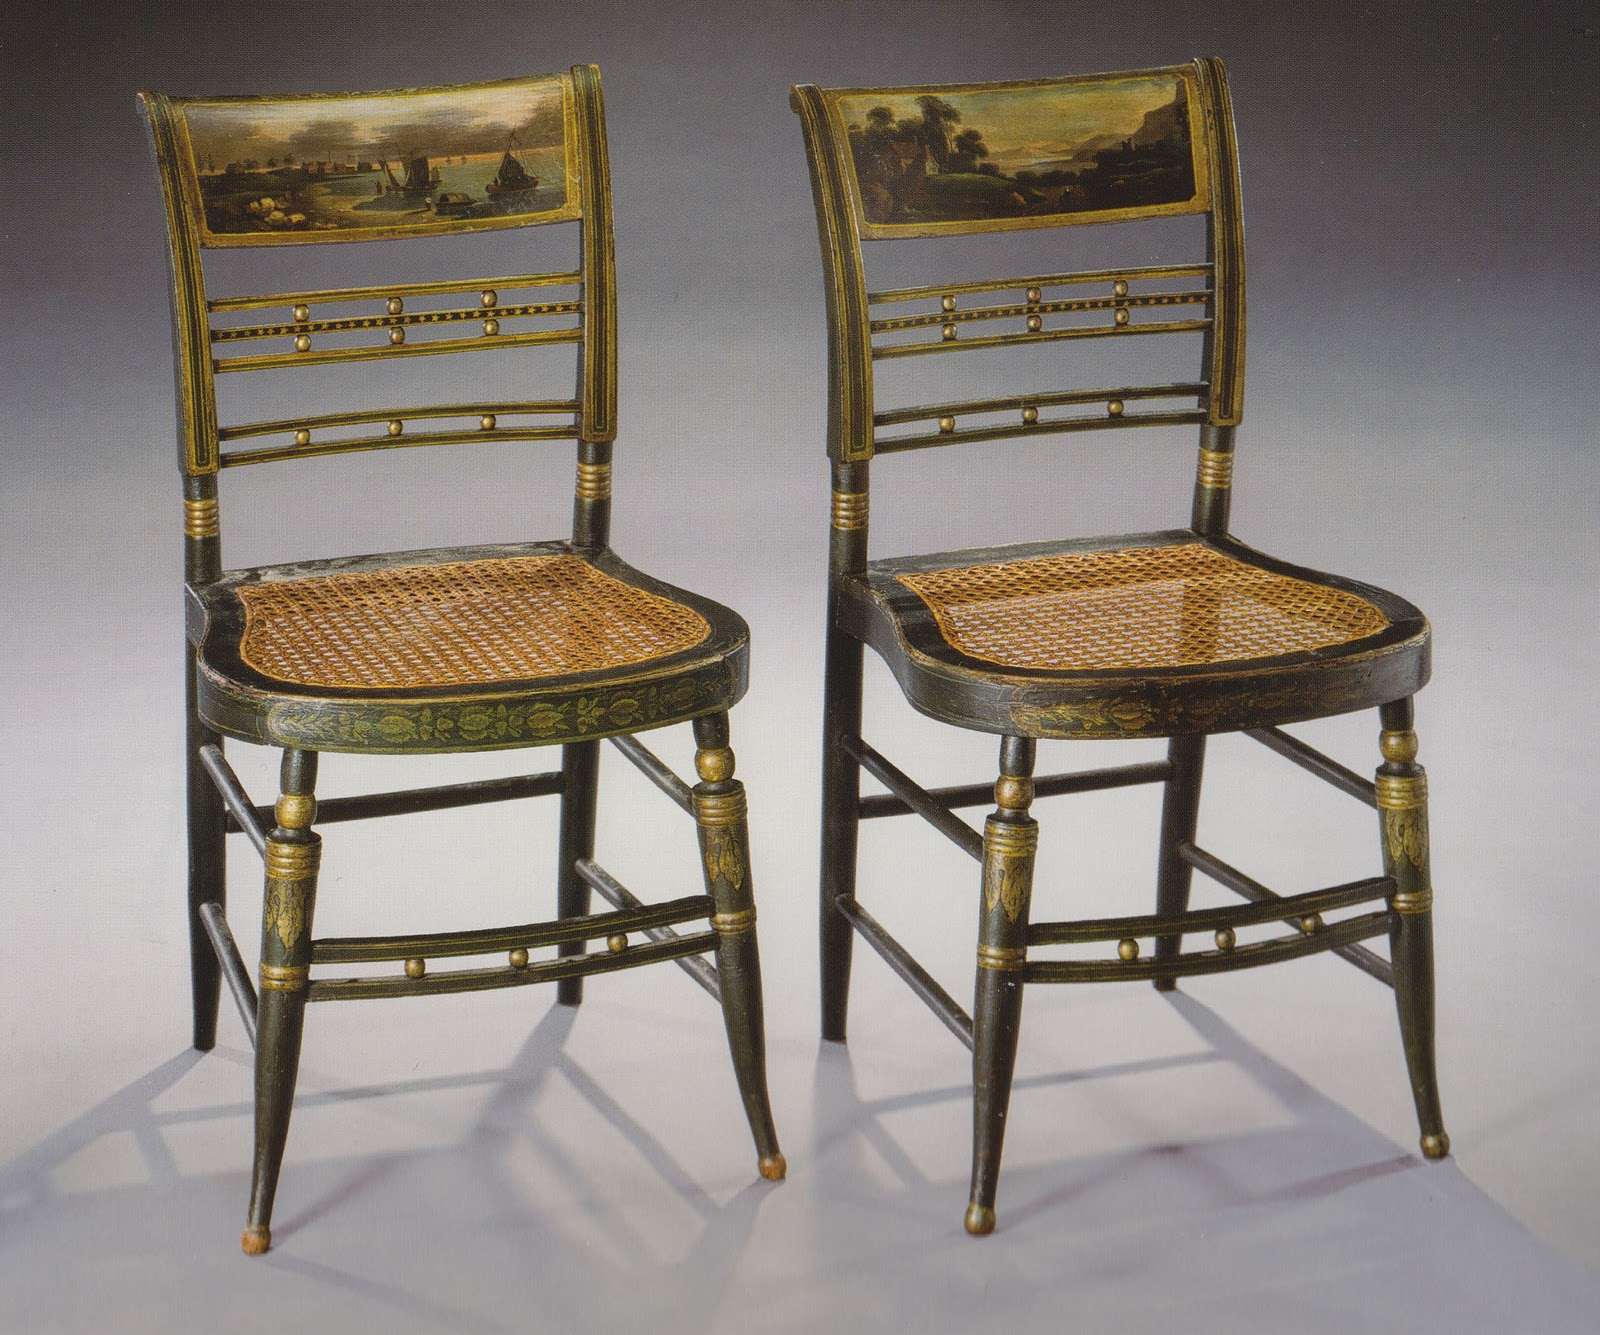 Reggie Darling: Winning Bid: American Fancy Chairs